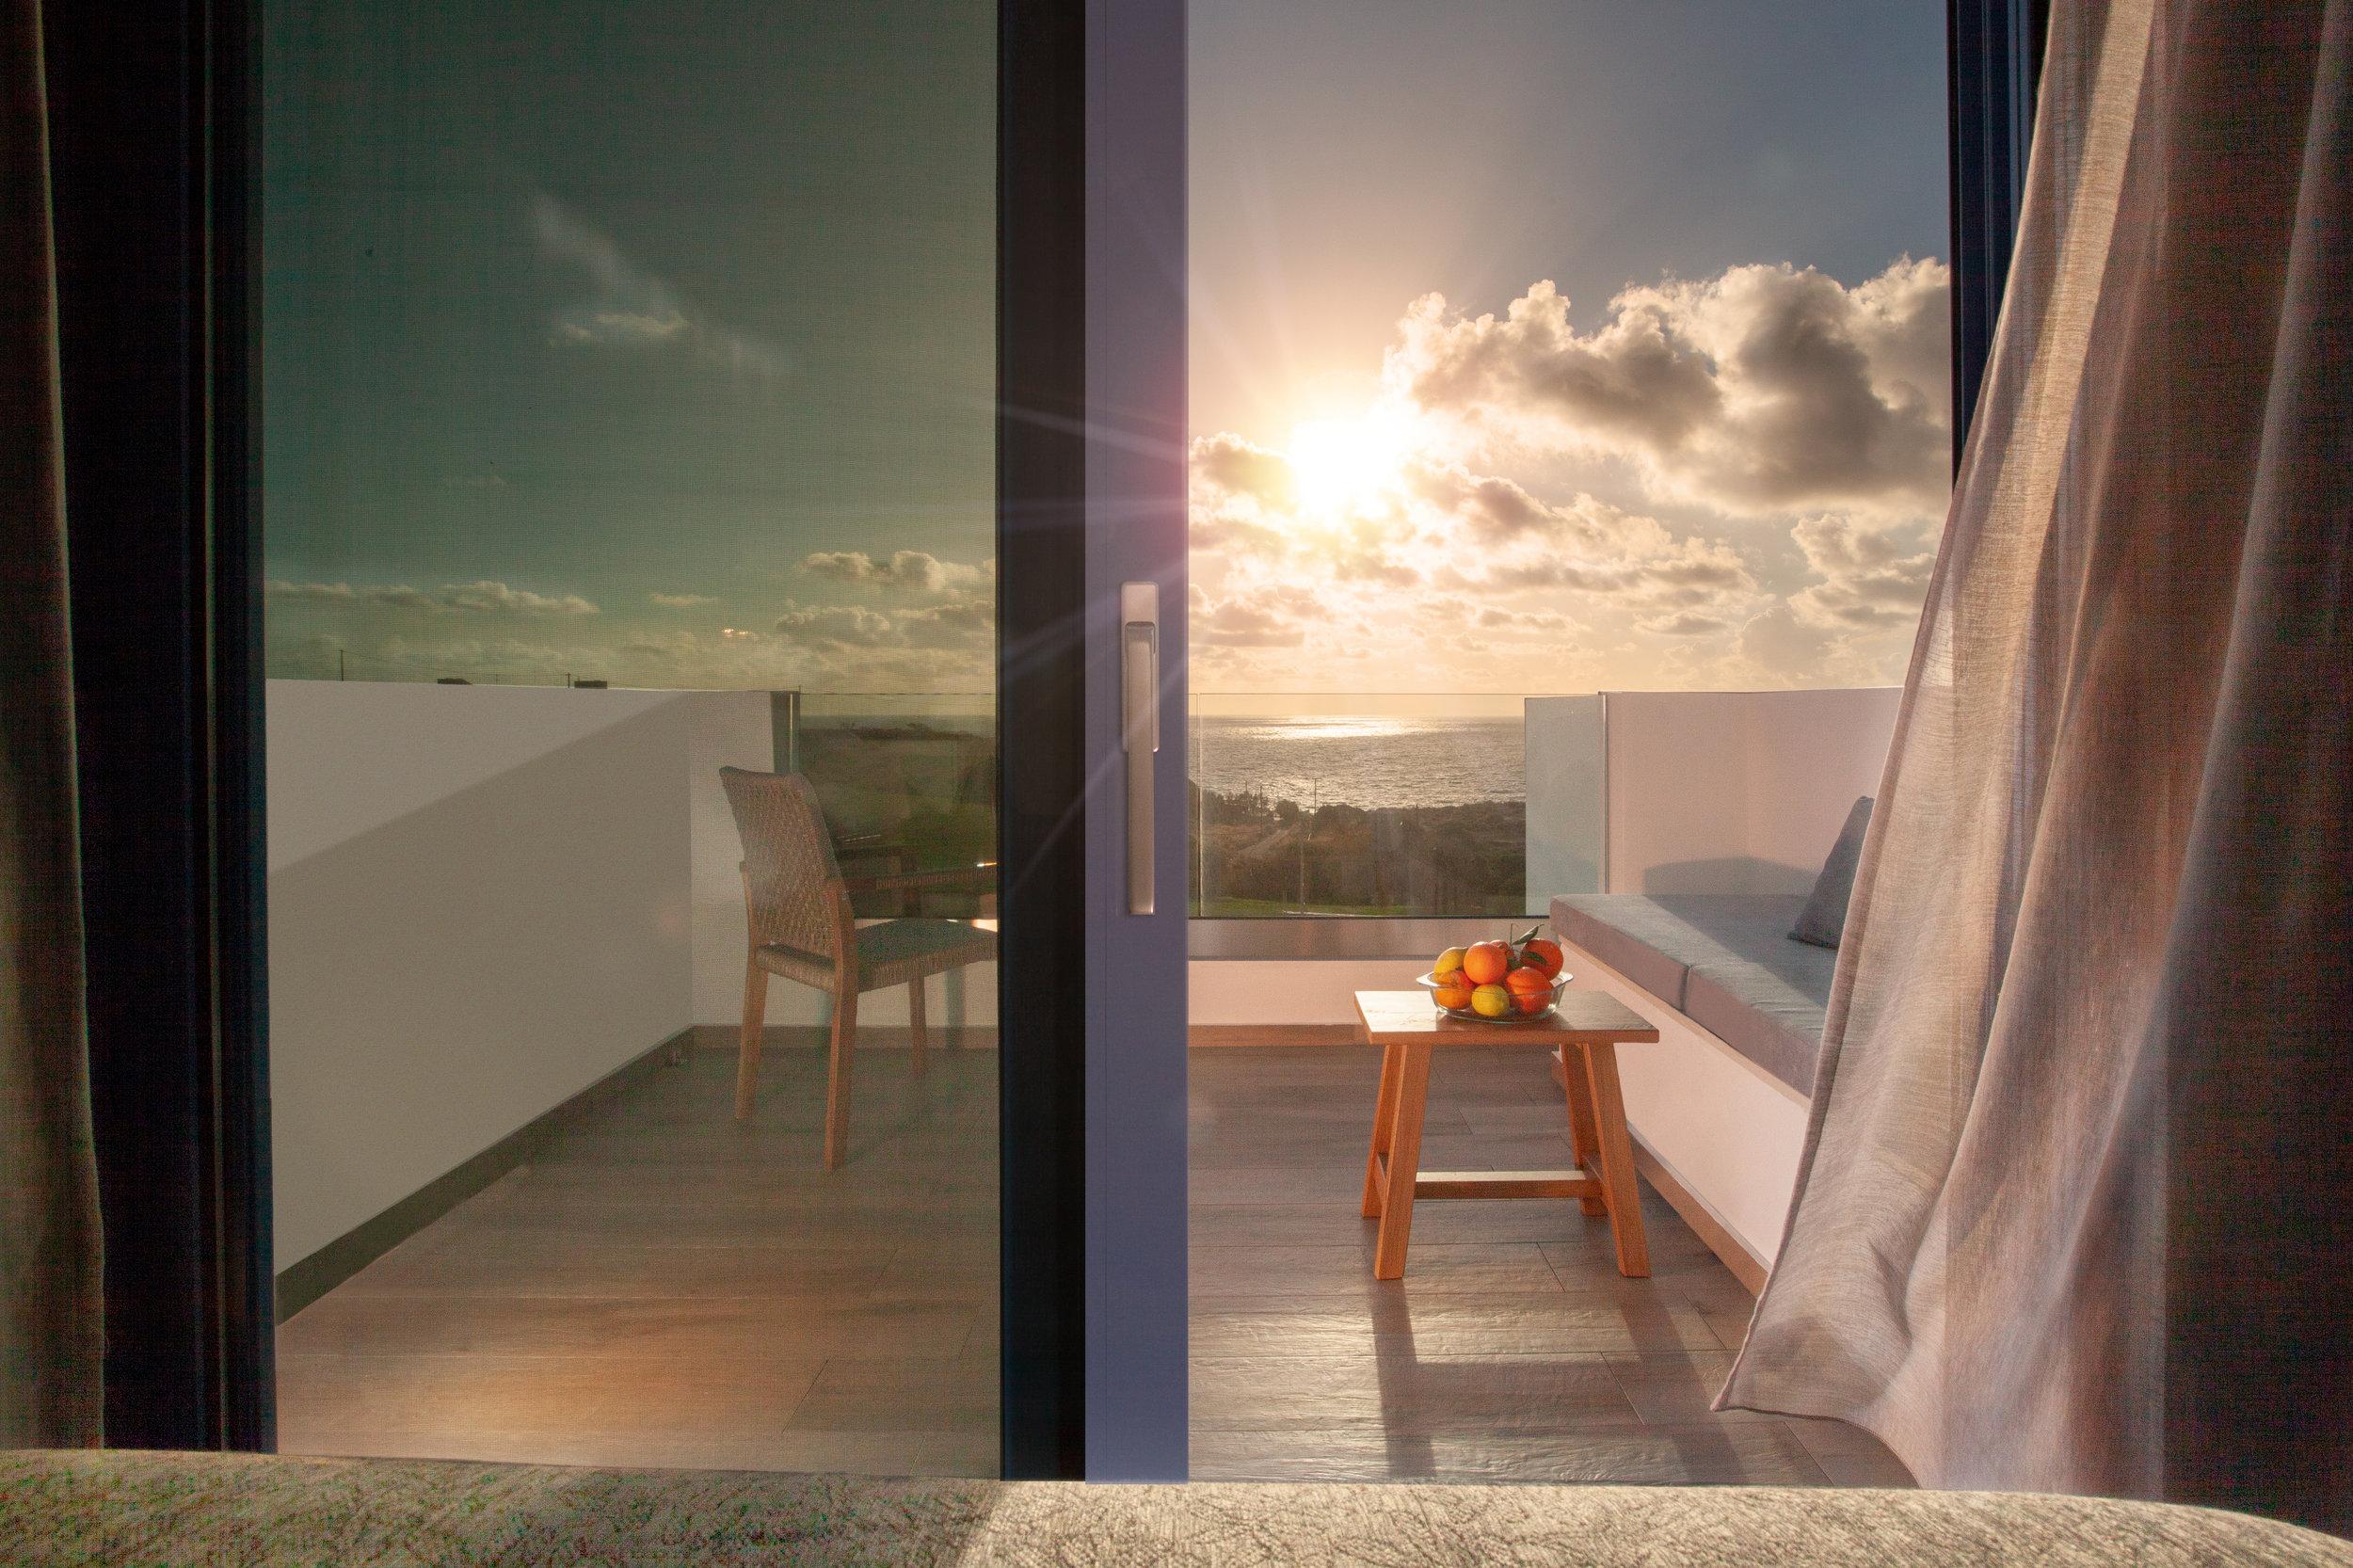 Sunrise-Balkon.jpg